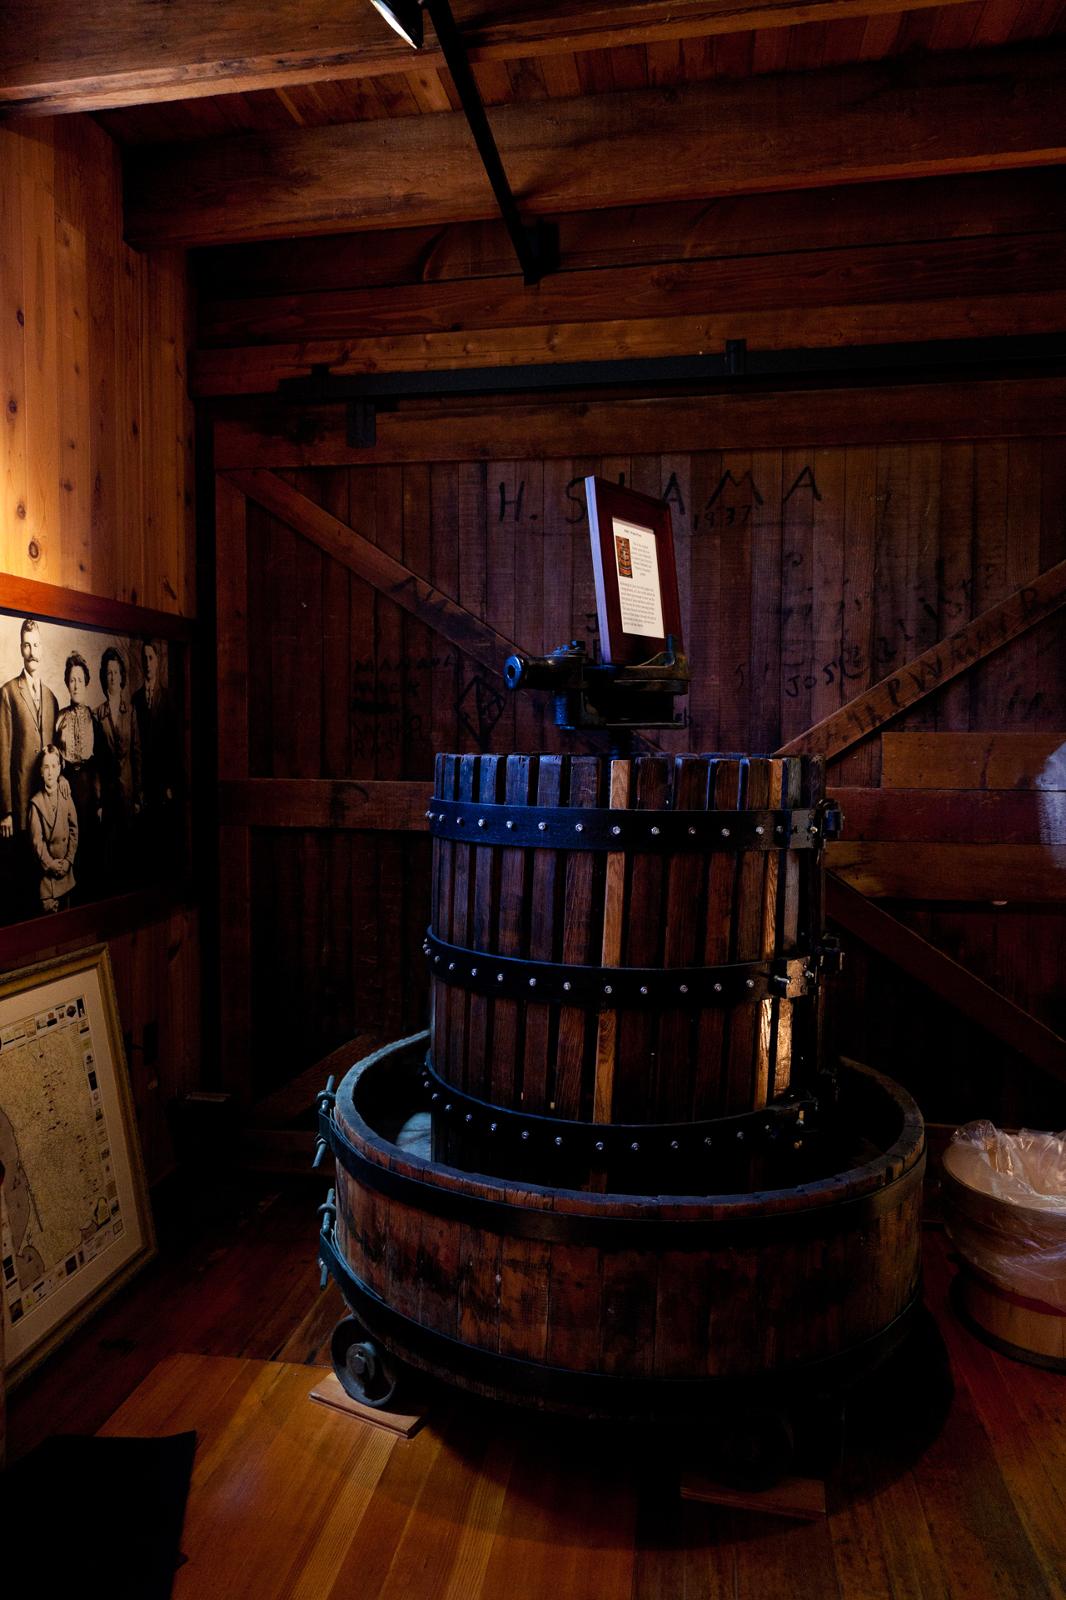 Grape presser at winery